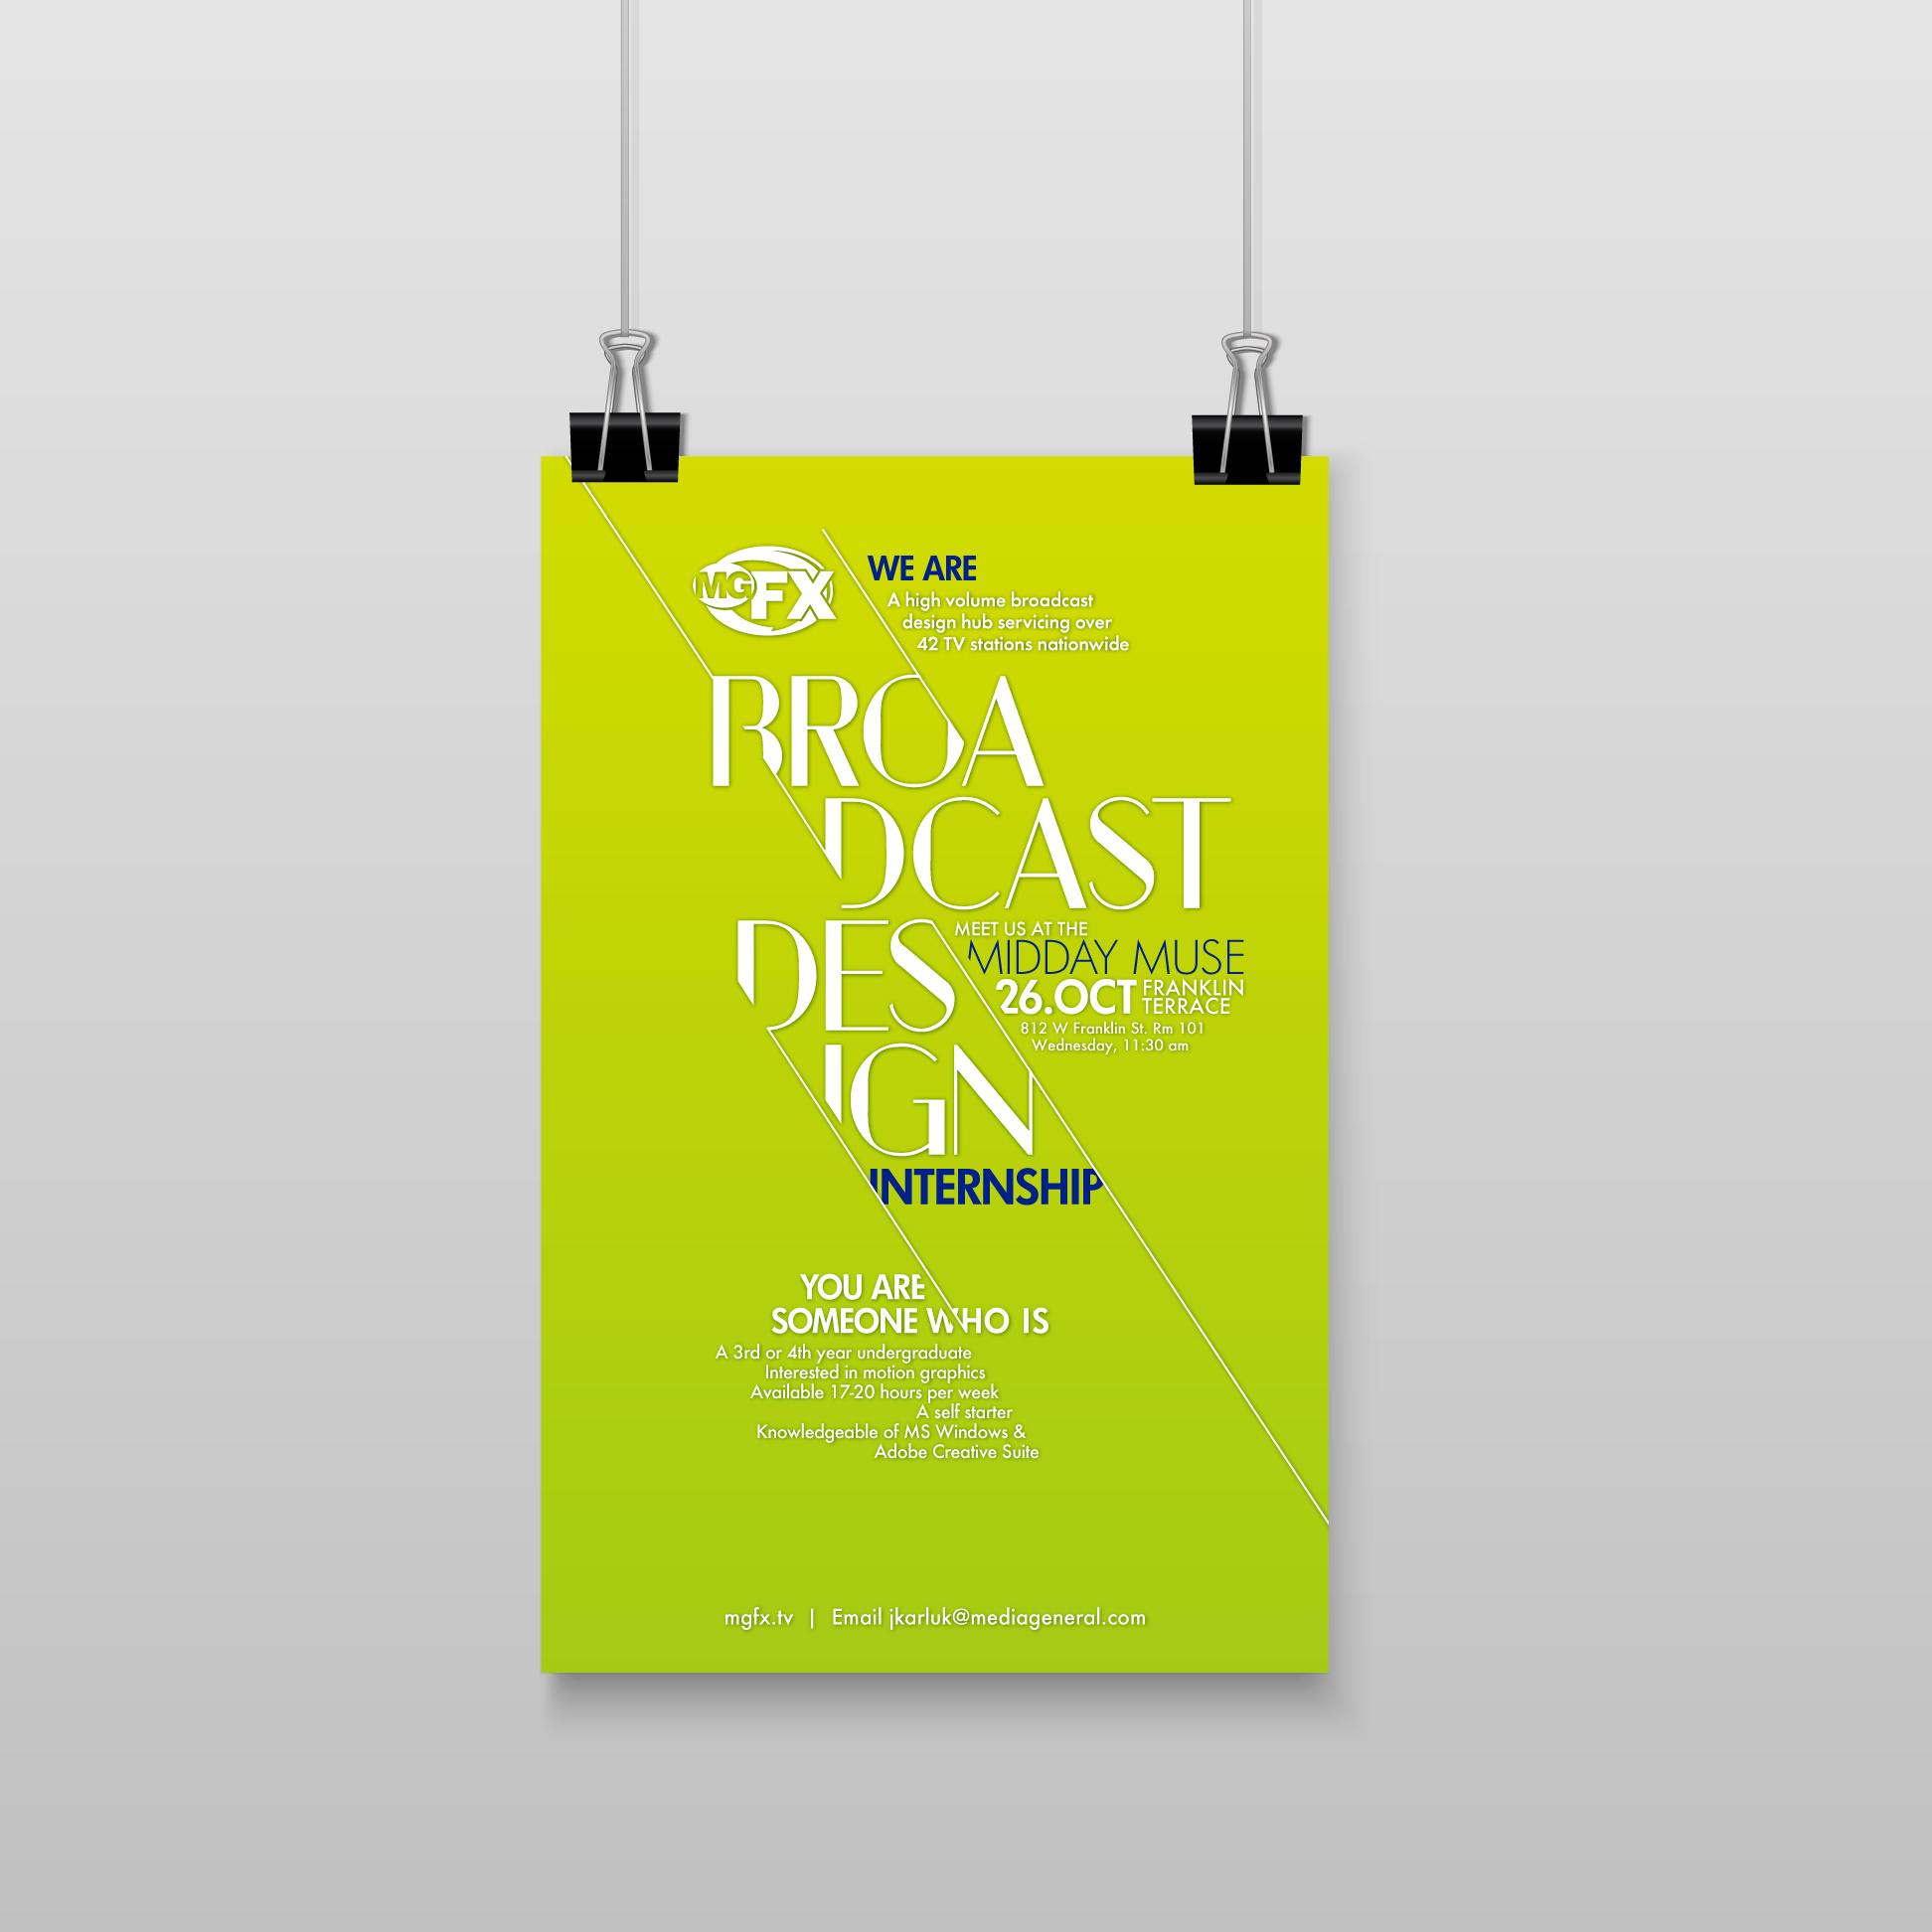 Internship Posters Crystal Cregge Designs